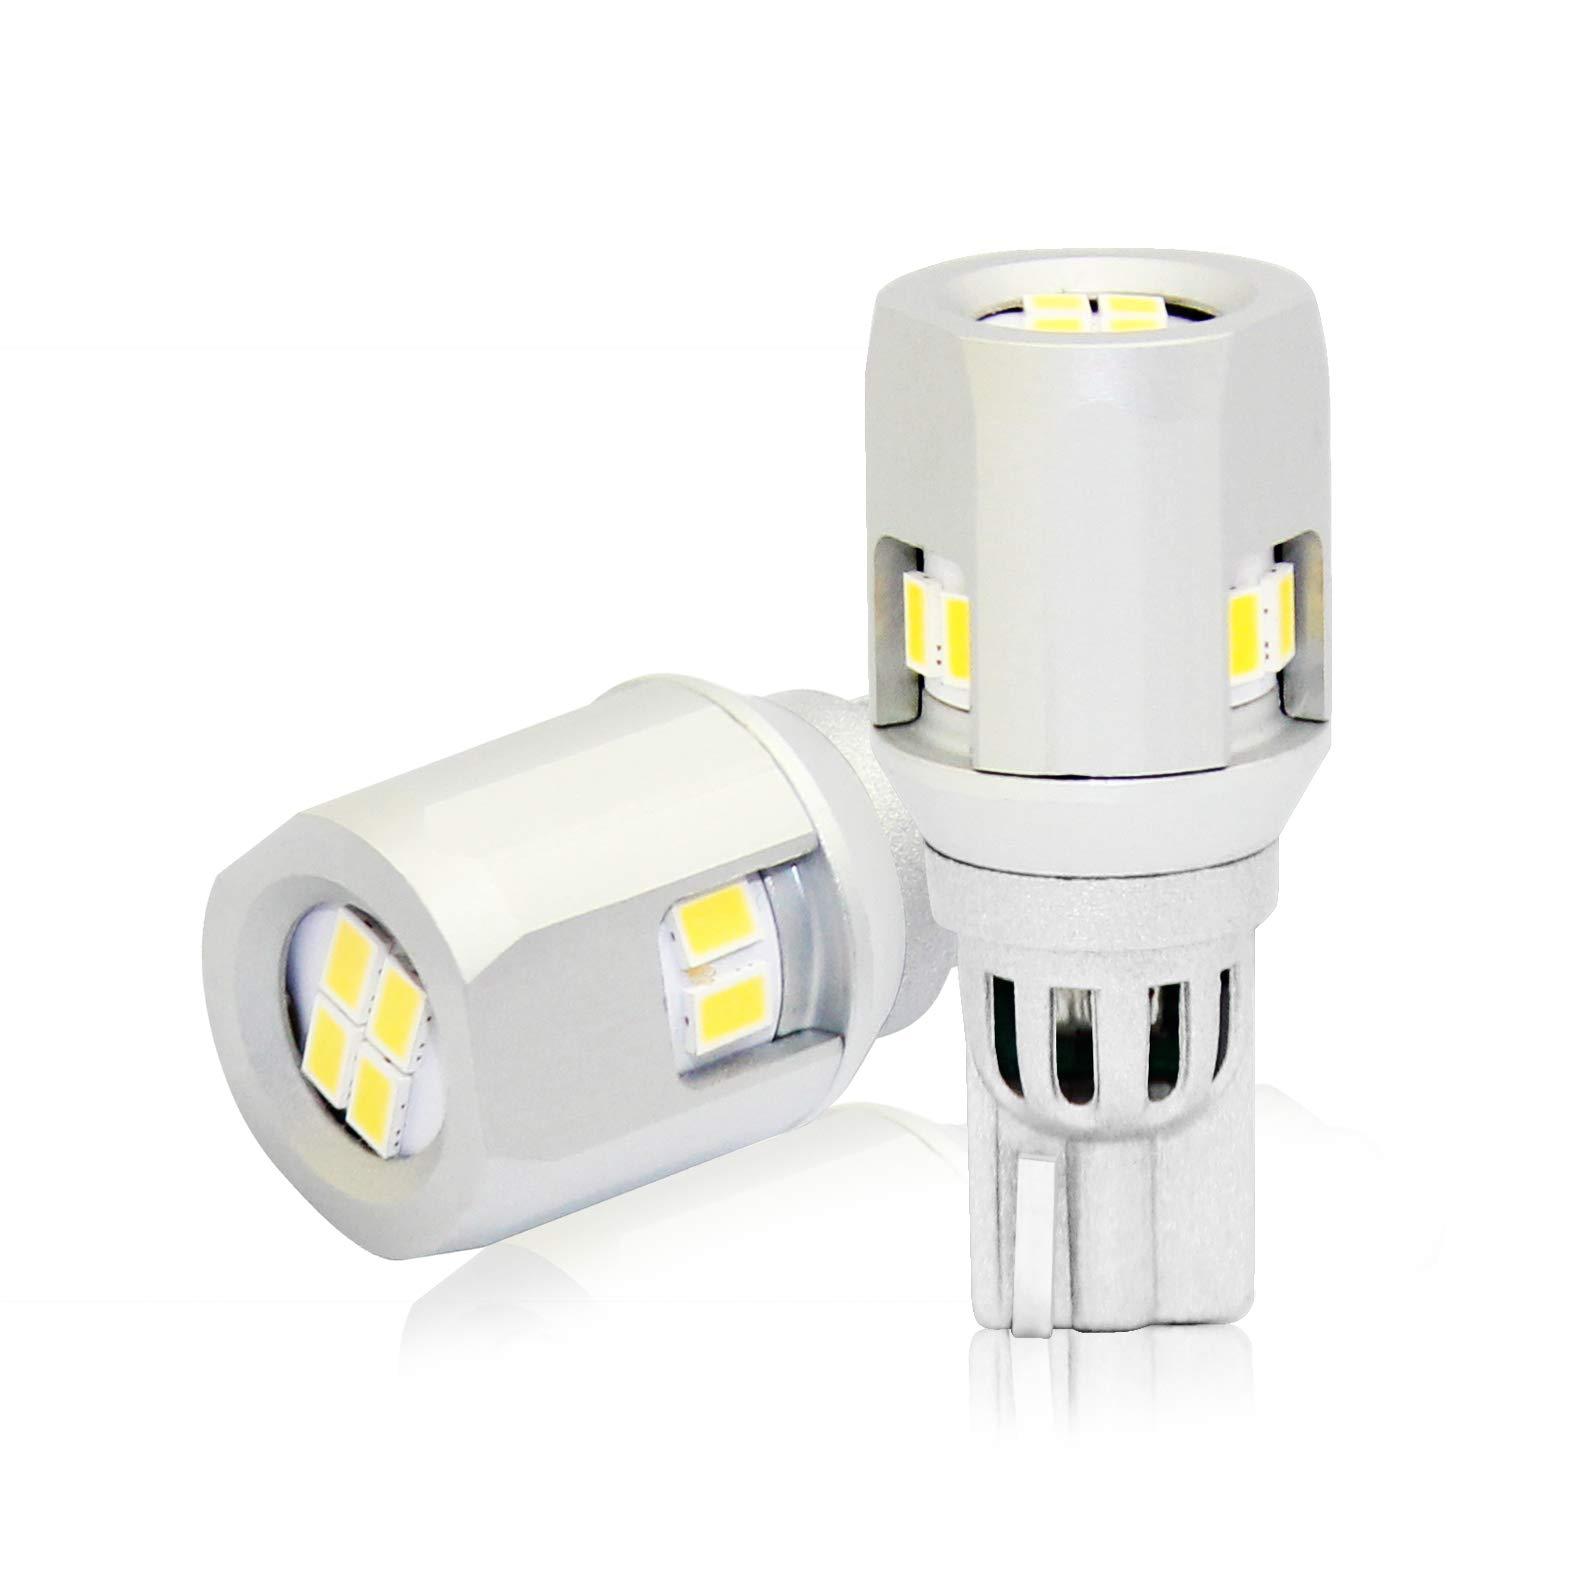 912 921 LED Backup Light Bulbs , D-Lumina High Power 904 Led 902 Bulbs 3030 10-SMD Chipsets Canbus Error Free T15 906 W16W for Back Up Lights Reverse Lights, 6000K White (2PCS/pack)